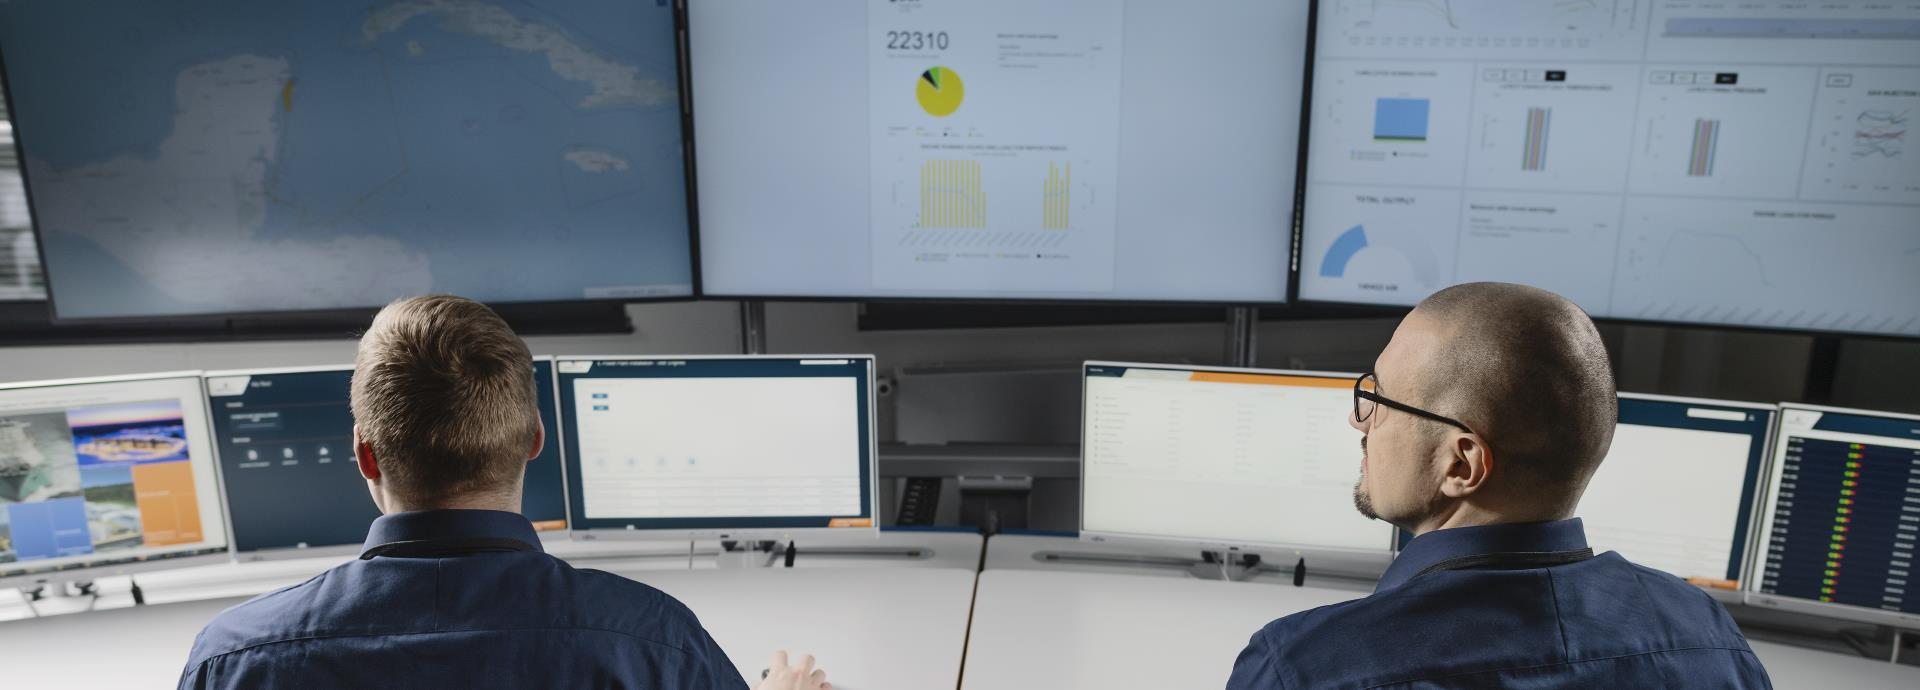 Data driven marine operations and maintenance webinar banner